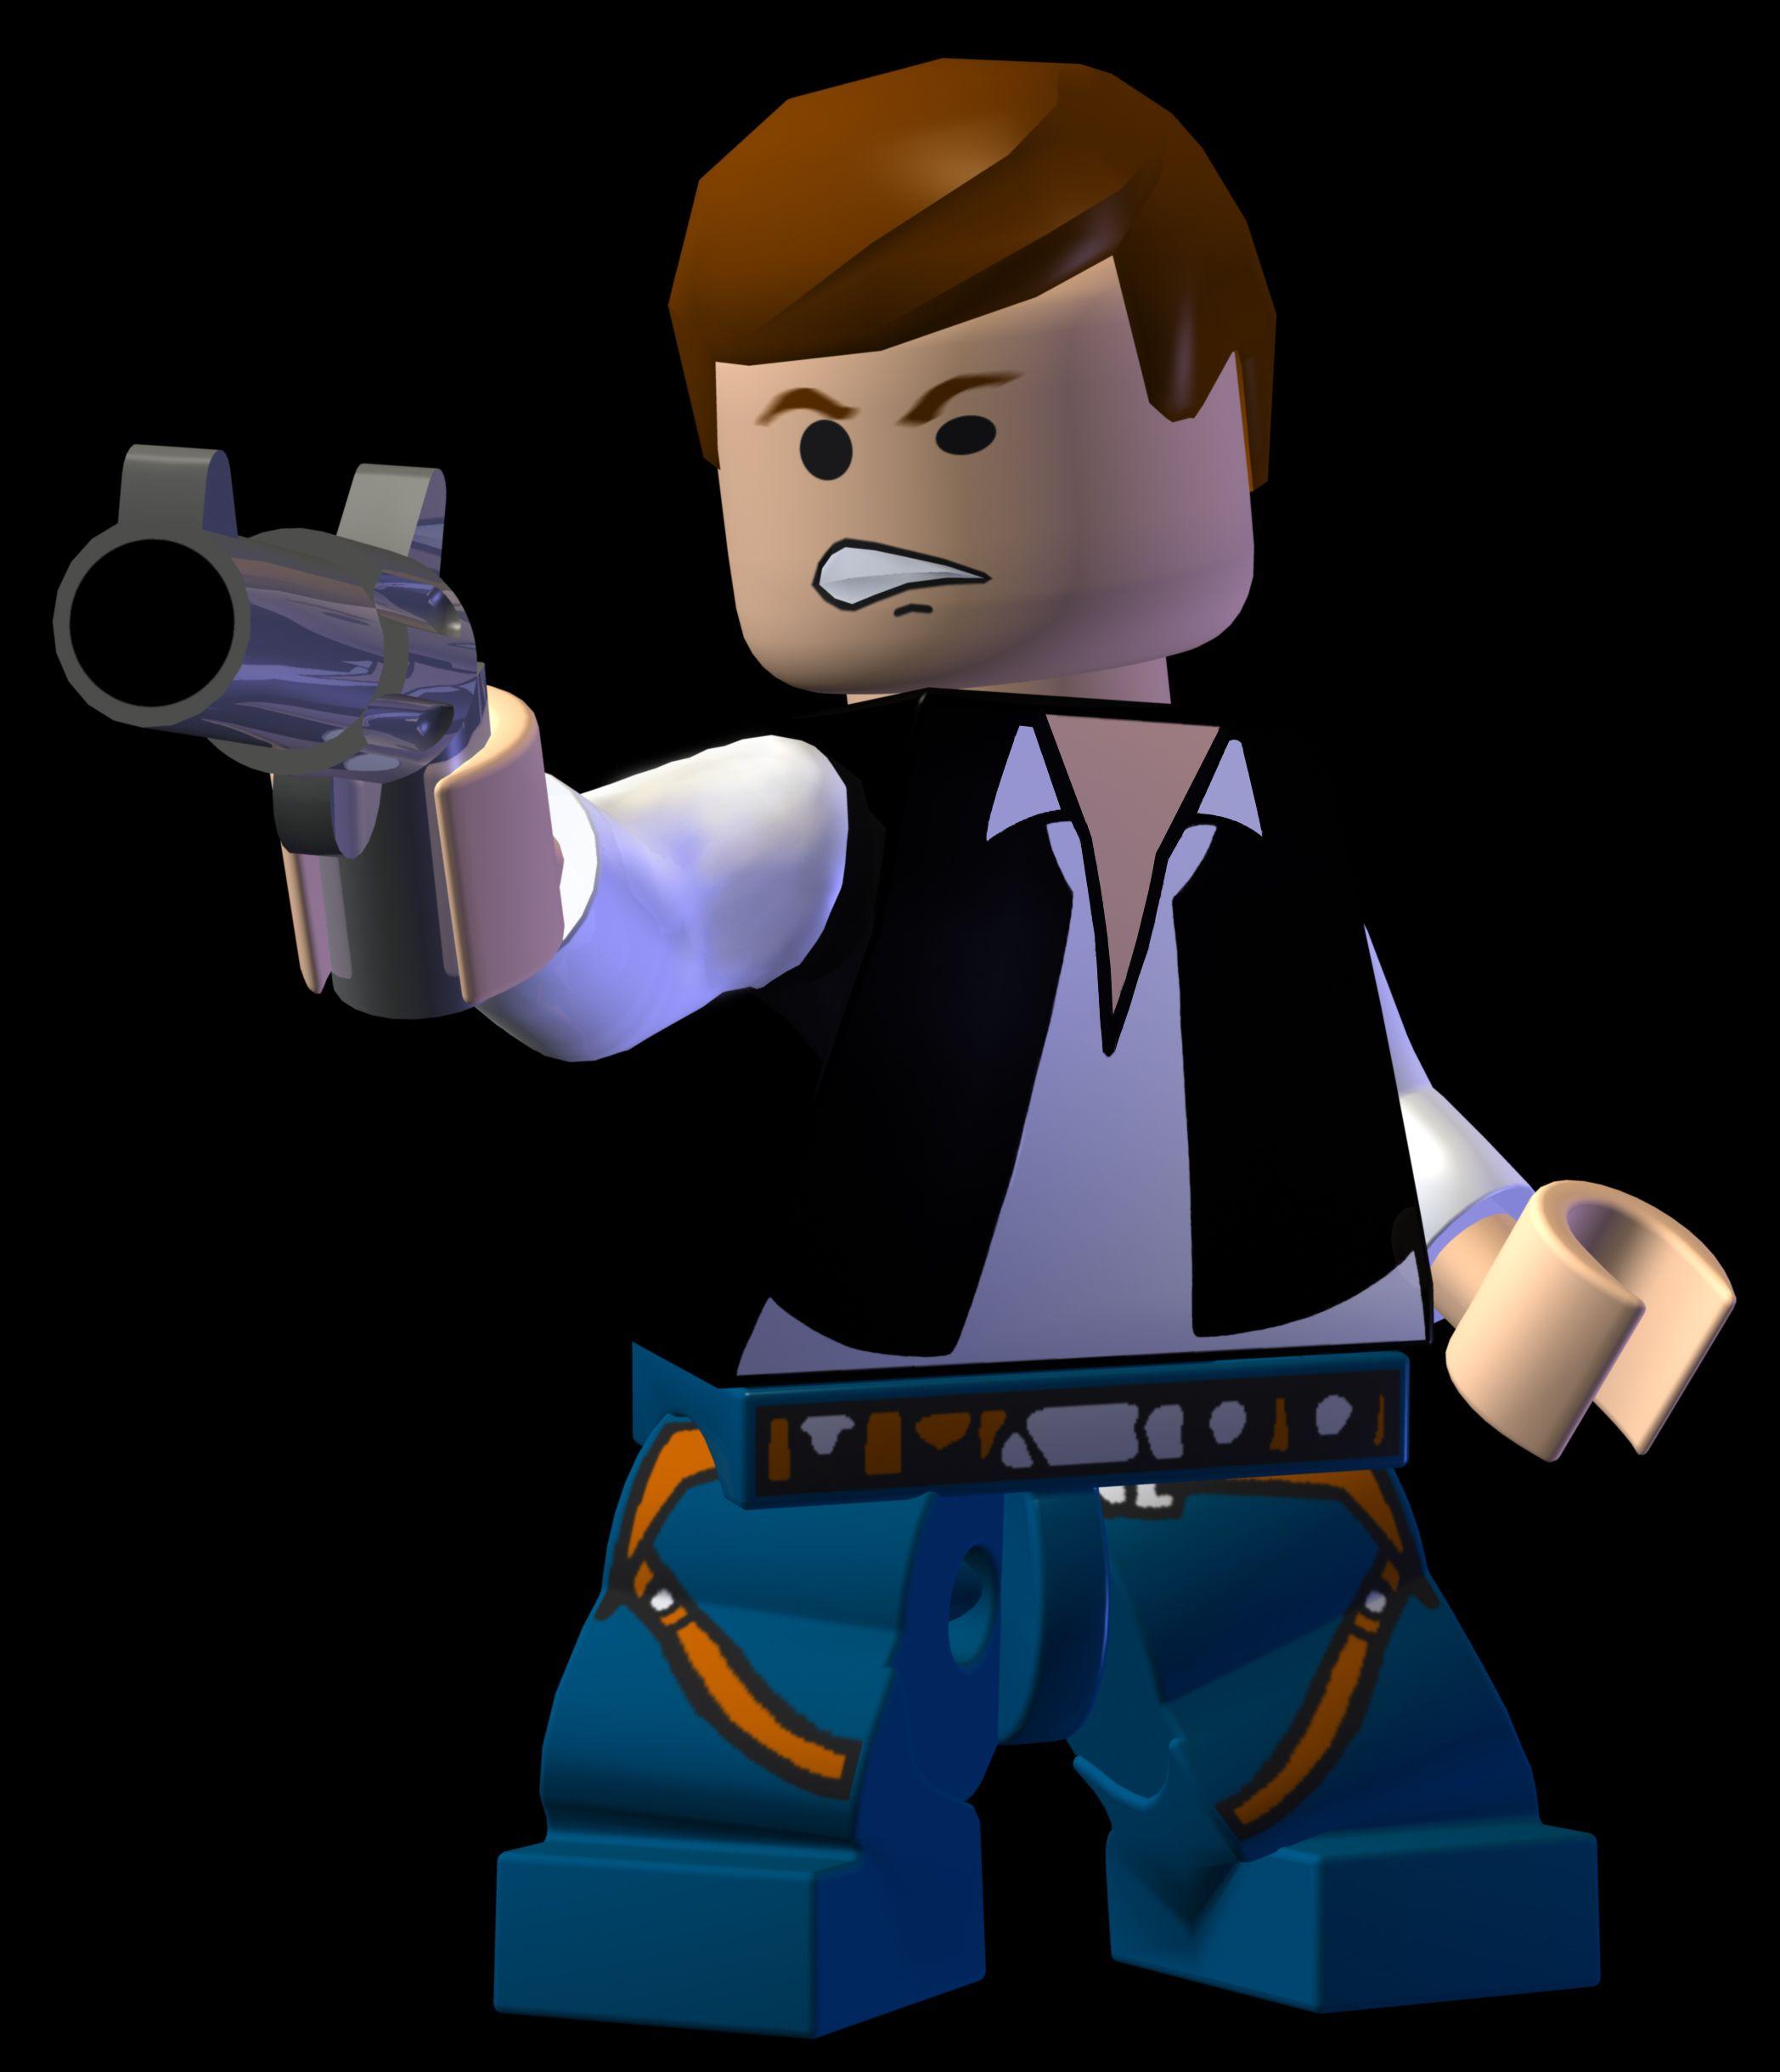 Han Solo Lego star wars, Star wars han solo, Star wars